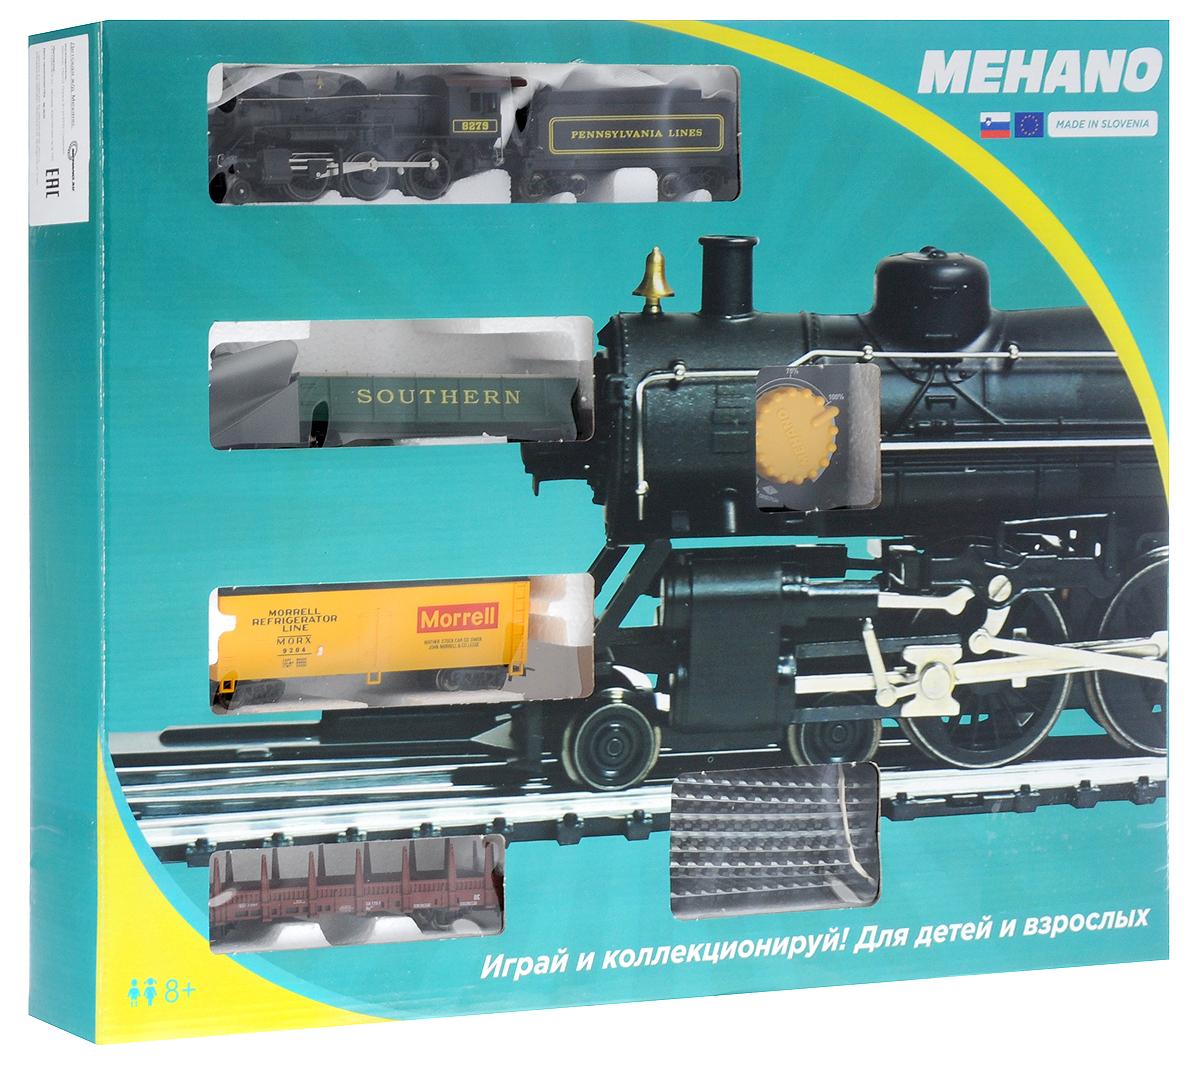 Mehano Железная дорога Hobby Mogul с паровозом Pennsylvania Lines 8279 - Железные дороги